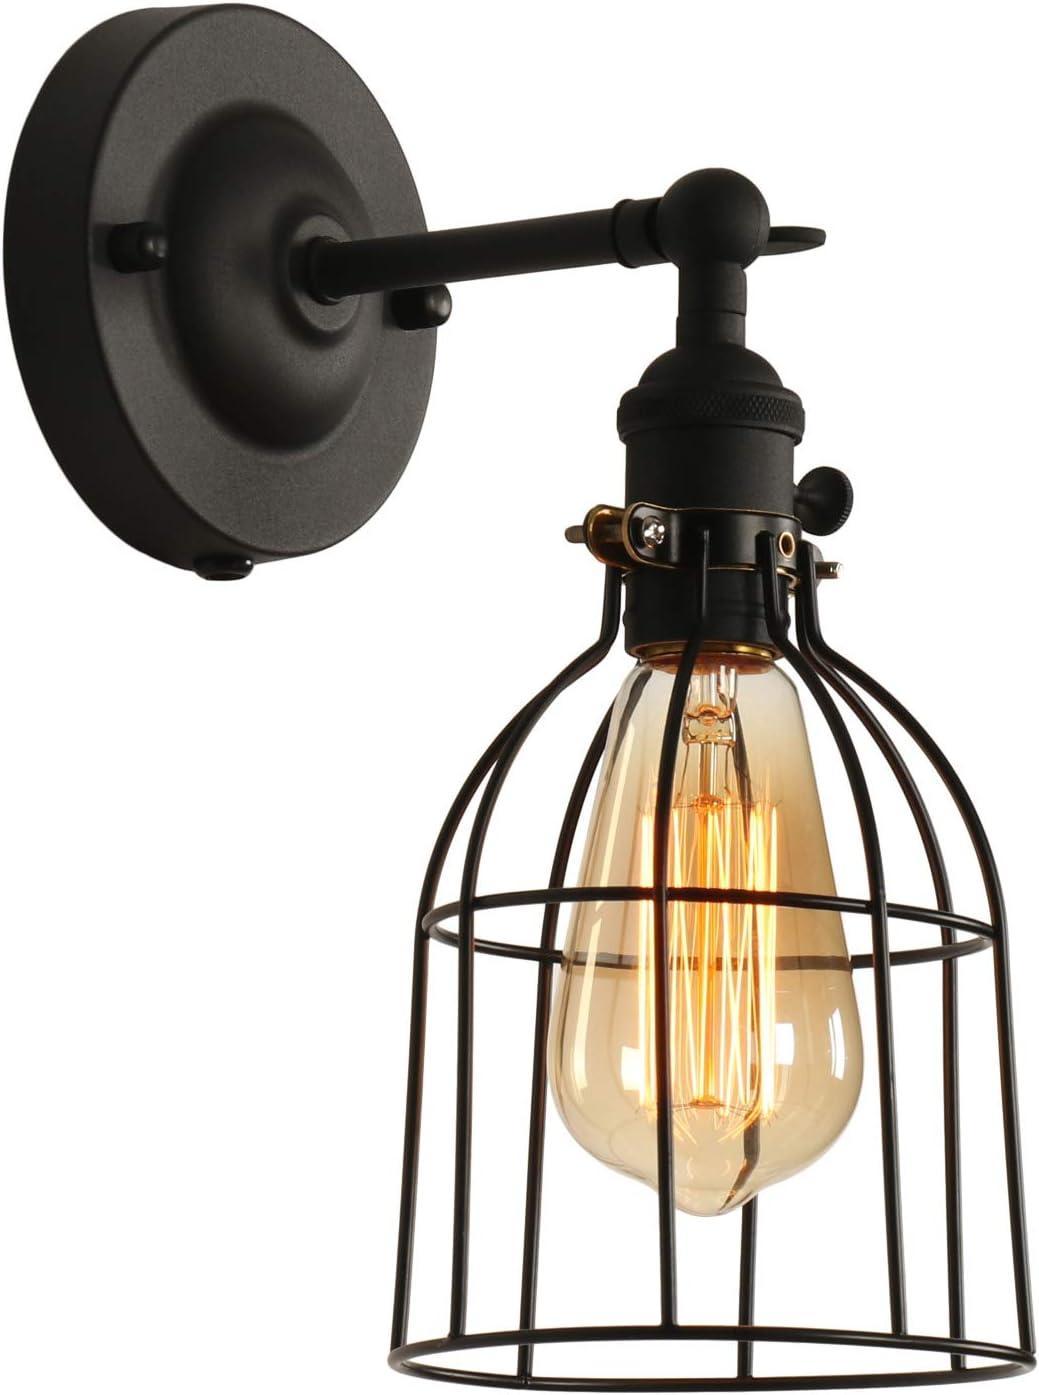 XIDING Premium Industrial Edison Antique Wa Wire At the price of Super special price surprise Cage Simplicity